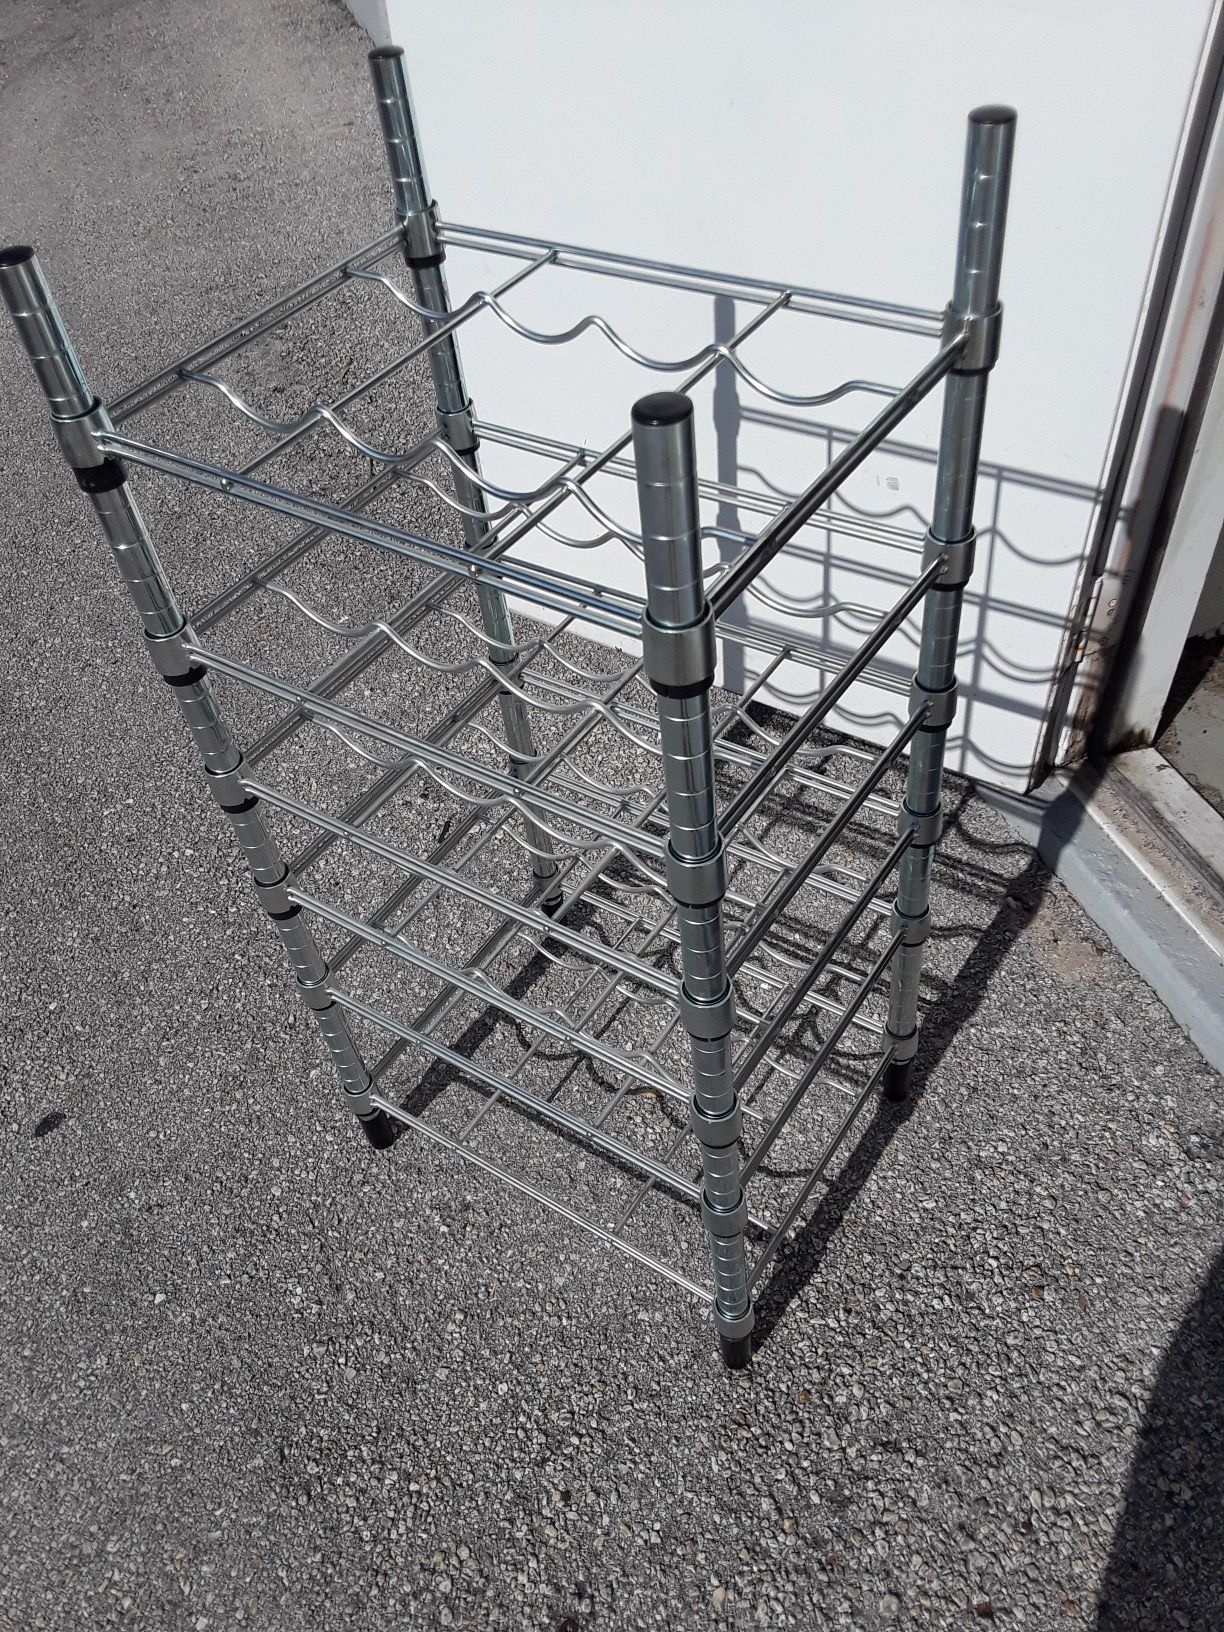 Stainless steel wine rake / shelf , fits 24 wine bottles